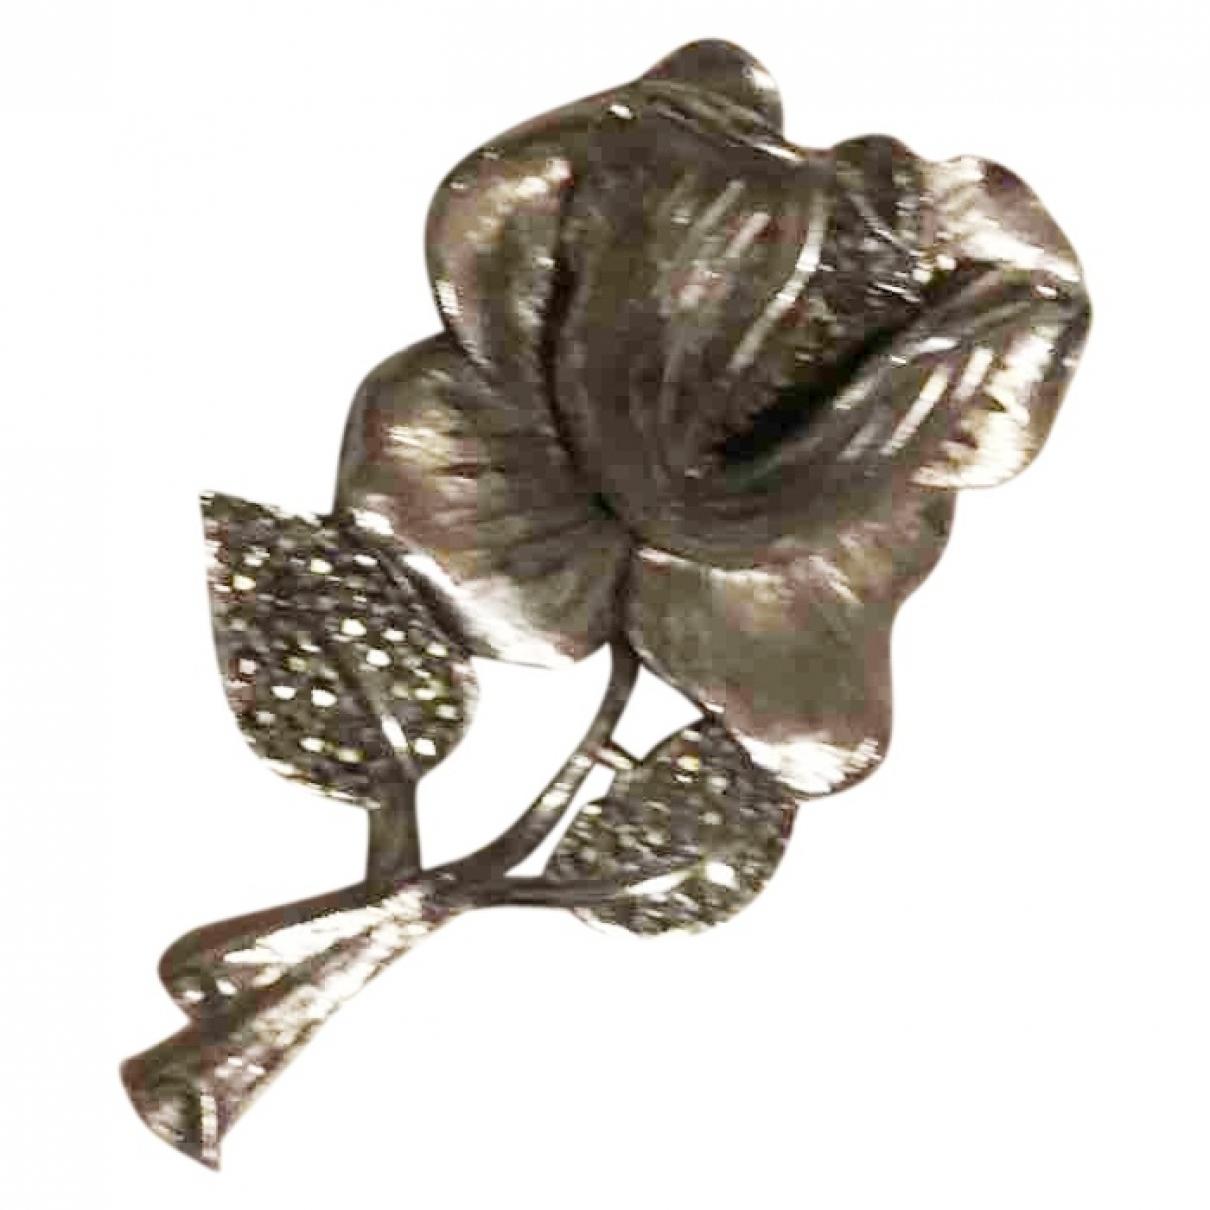 Broche Motifs Floraux en Metal Plateado Non Signe / Unsigned